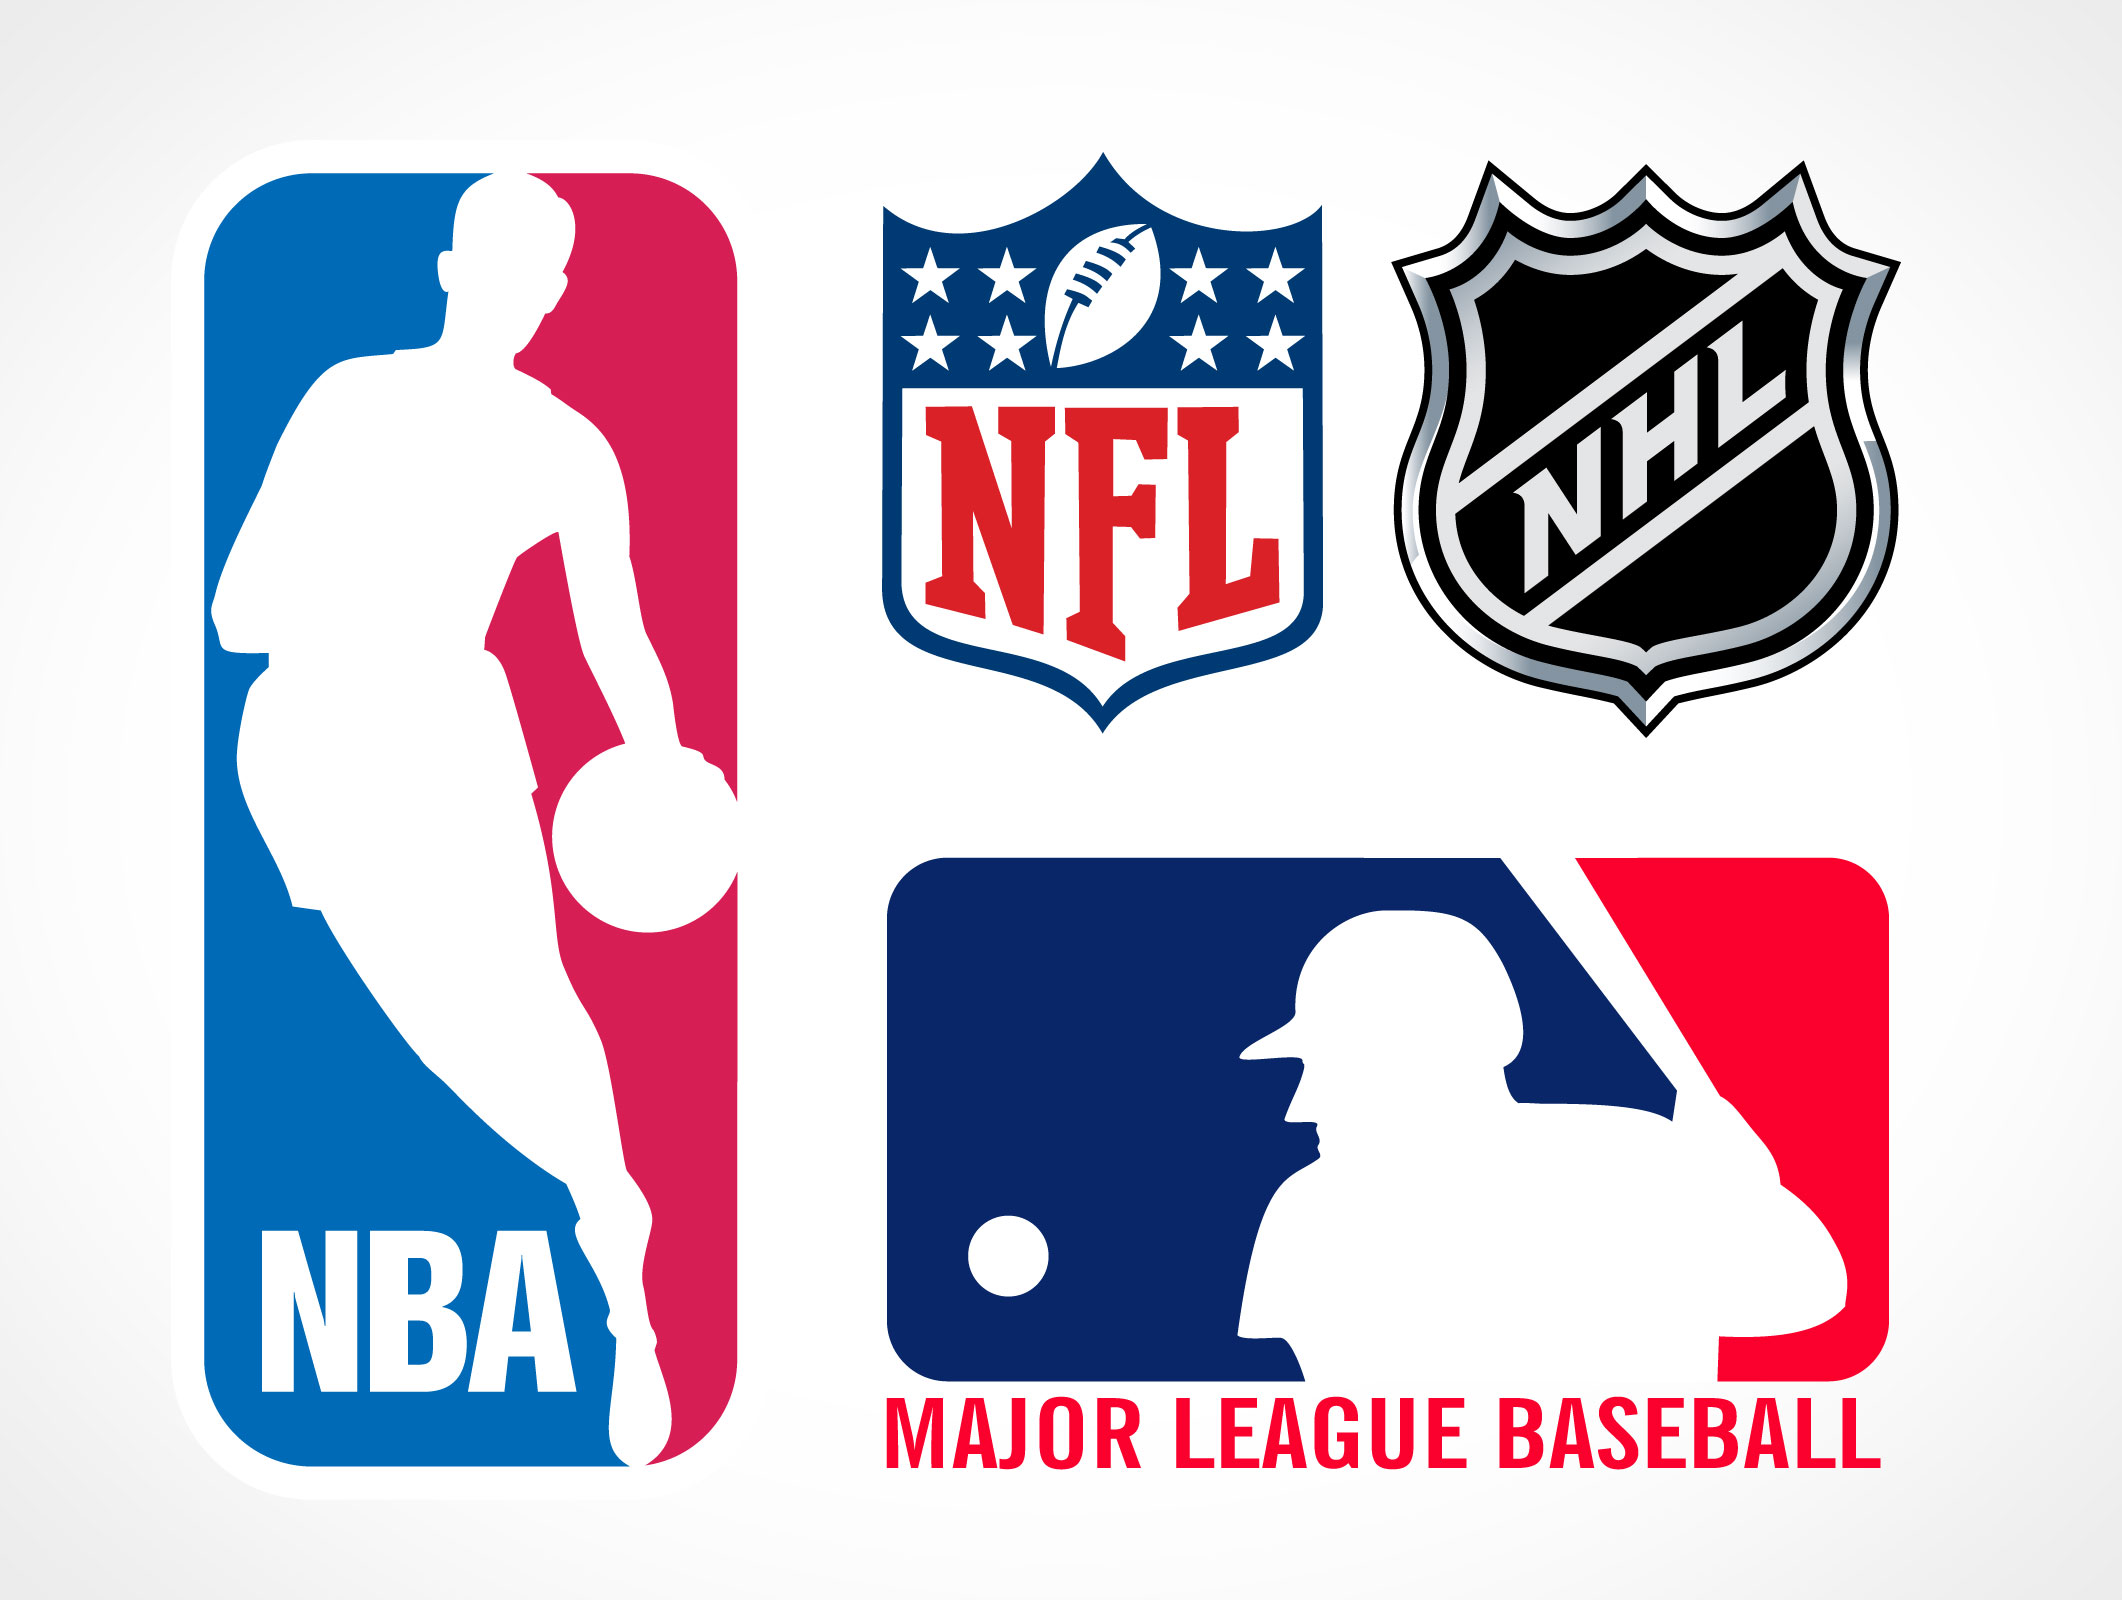 sports svg logos sport teams team psdcovers cricut nfl baseball vector insignia svgs file market sources psd football pro league